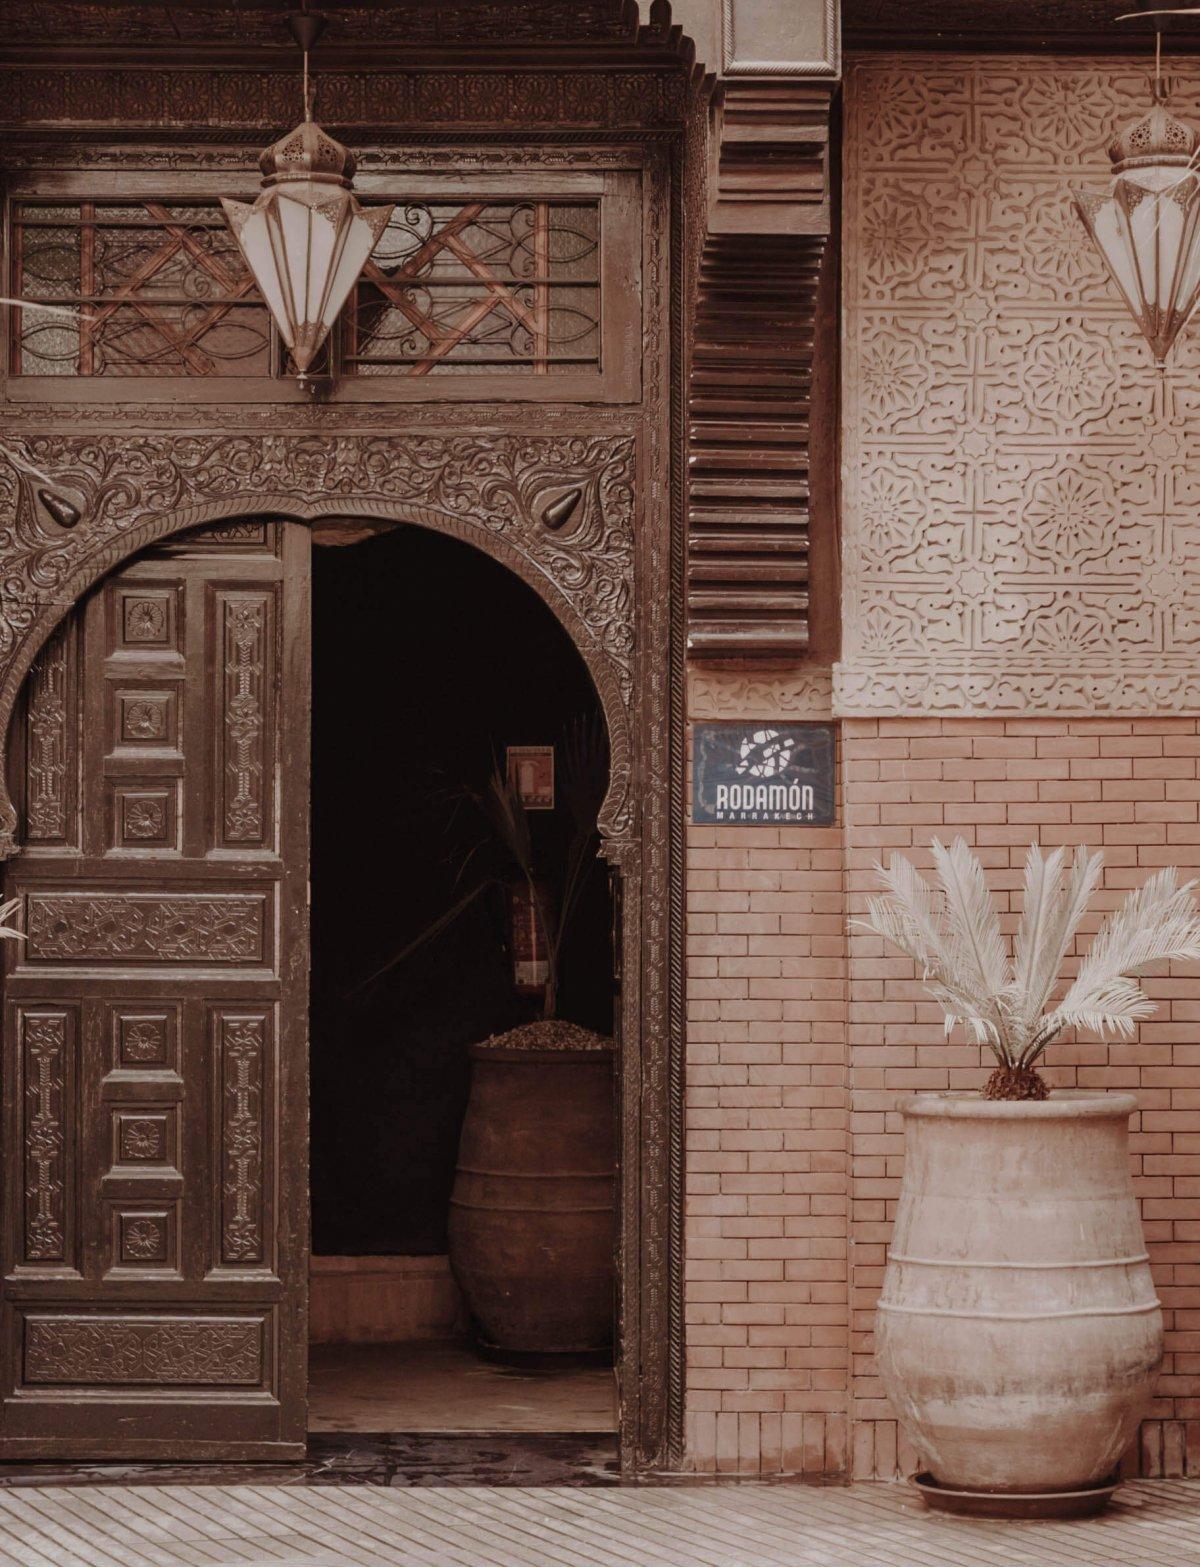 Rodamón Riad in Marrakech – hier wil je verblijven!